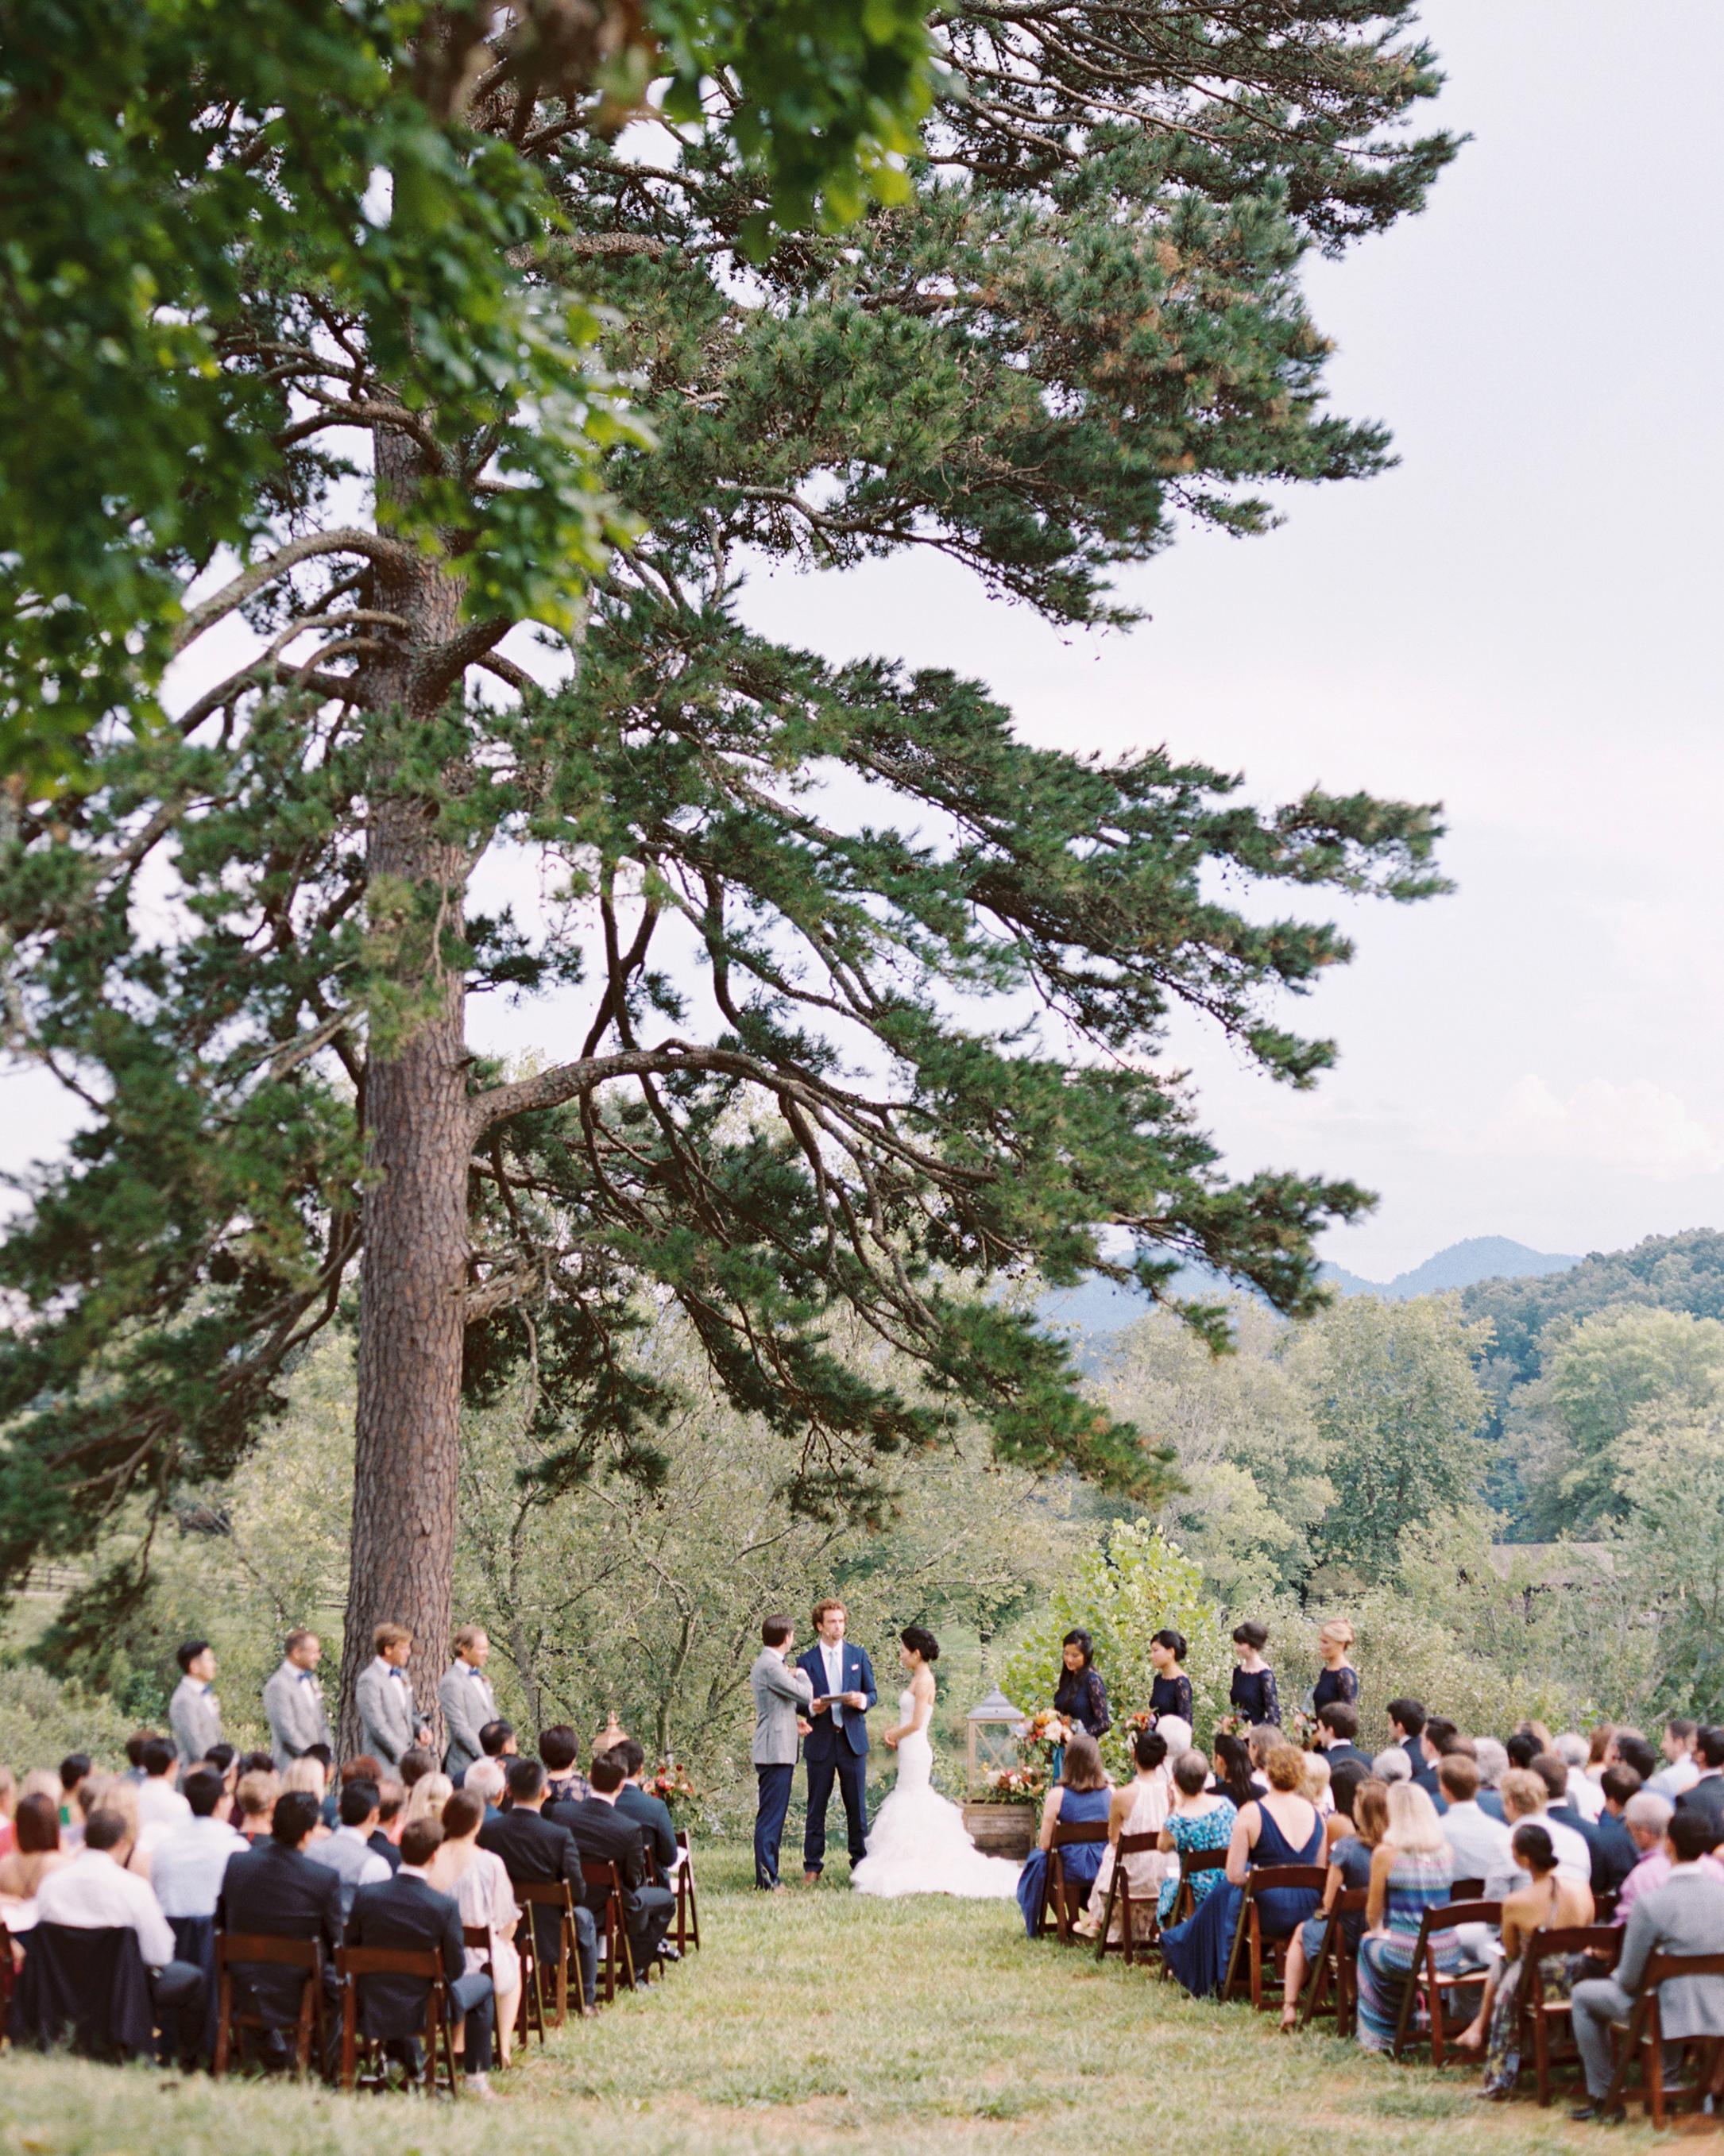 michelle-john-wedding-north-carolina-9-s111840-0215.jpg